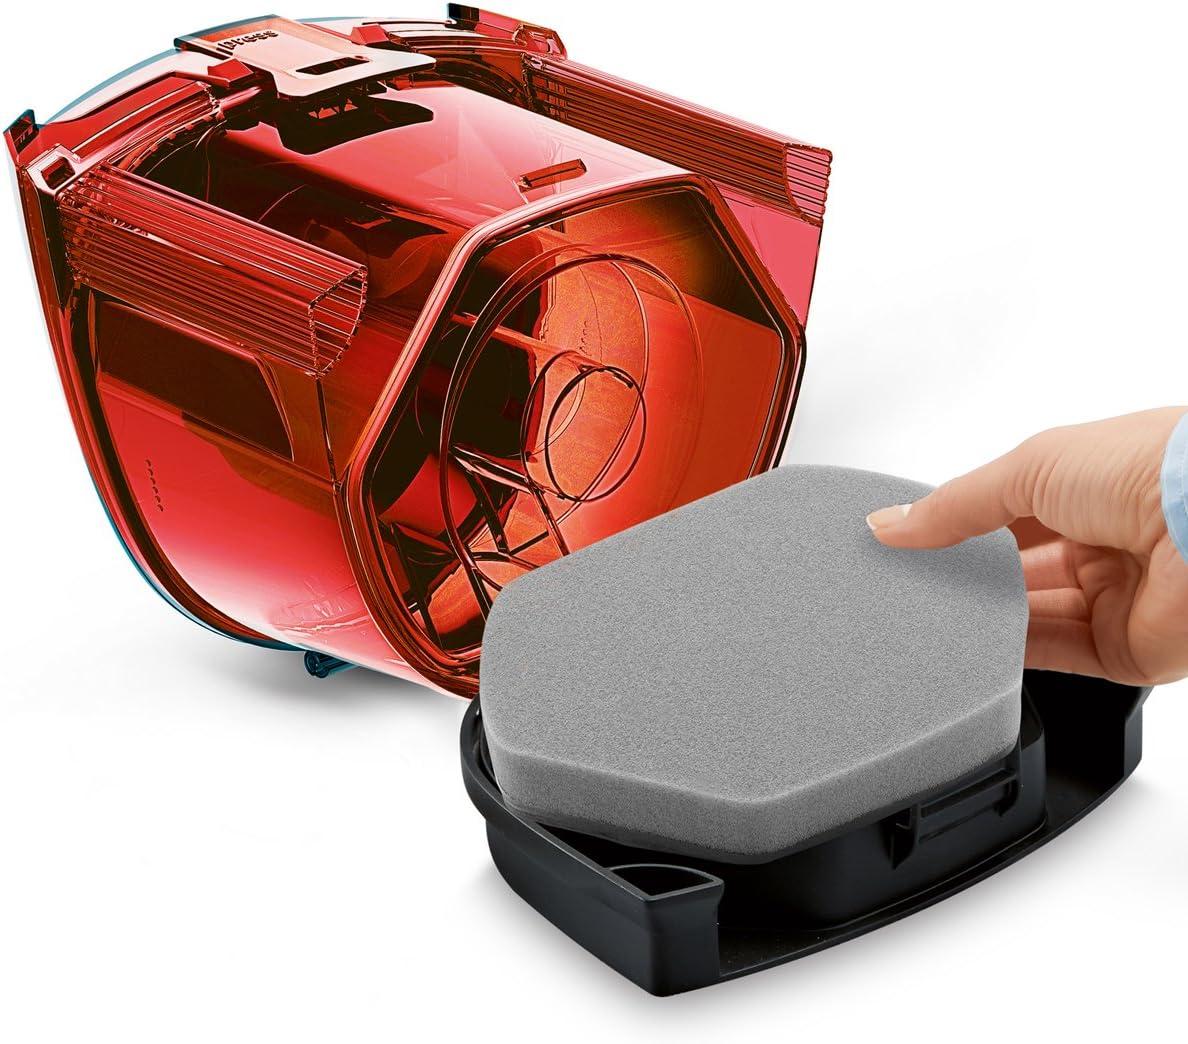 Bosch BGC1UA110 Aspirador sin Bolsa GS-10, diseño Ultra-Compacto, Filtro Lavable, Cepillo Especial parquet, Color, [Etiqueta energética Clase A], 700 W, 1.4 litros, 80 Decibelios, Negro, Rojo: Amazon.es: Hogar